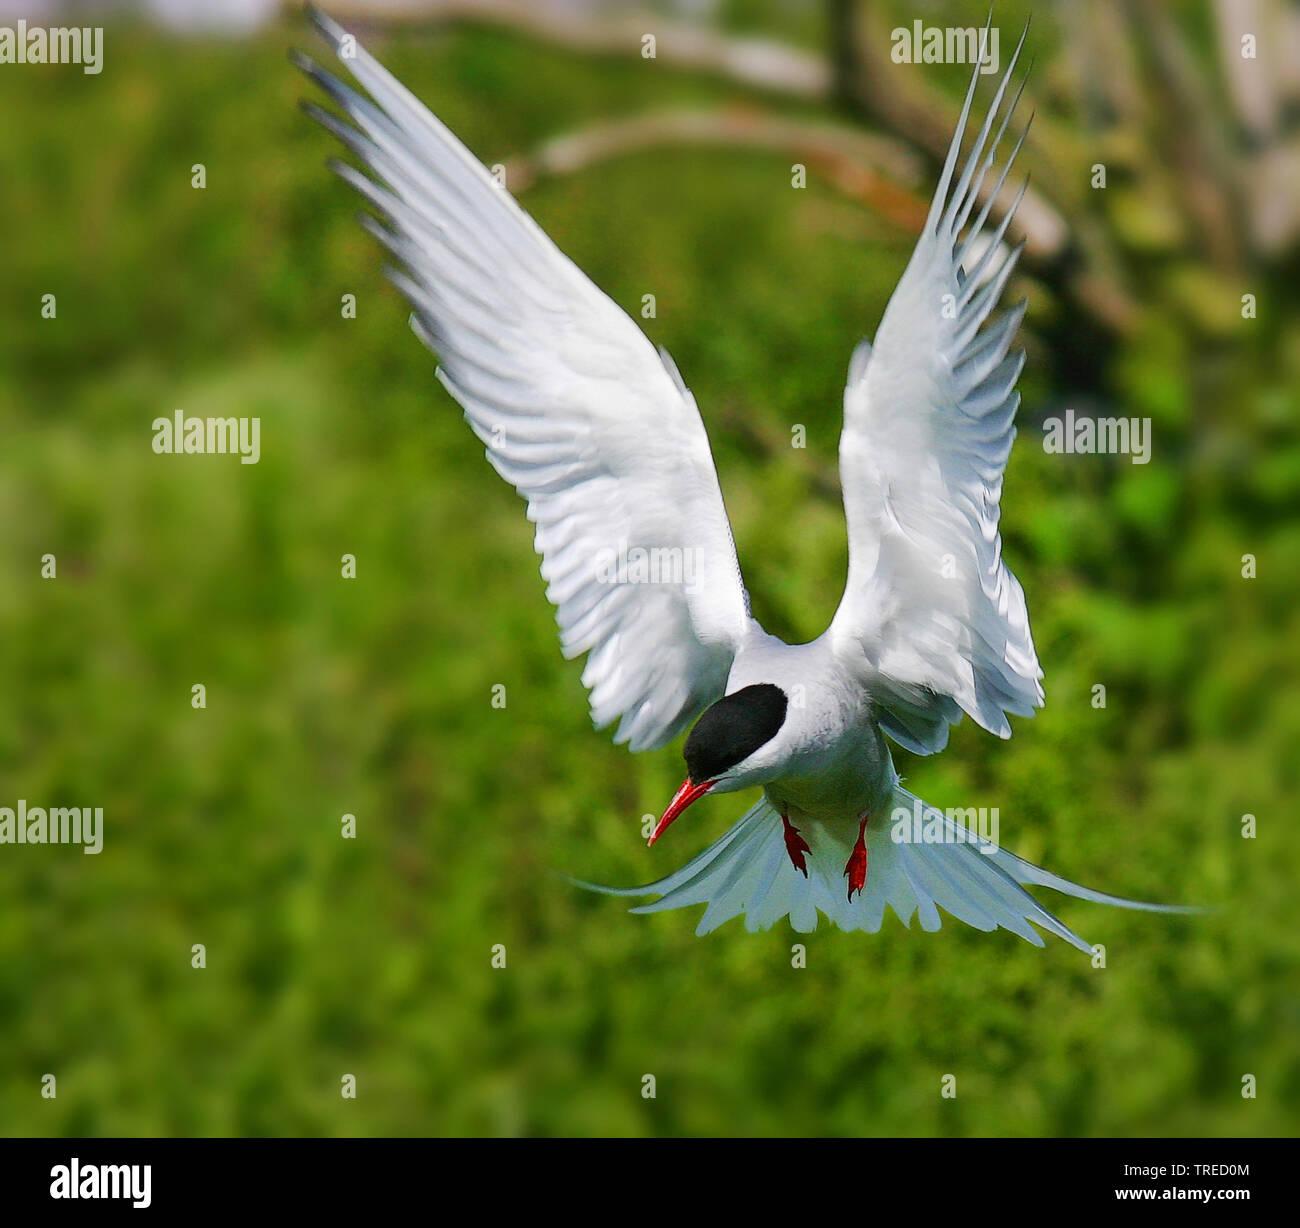 Kuestenseeschwalbe, Kuesten-Seeschwalbe (Sterna paradisaea), im Flug, Vorderansicht, Grossbritannien, England, Northumberland, Farne Islands | arctic - Stock Image